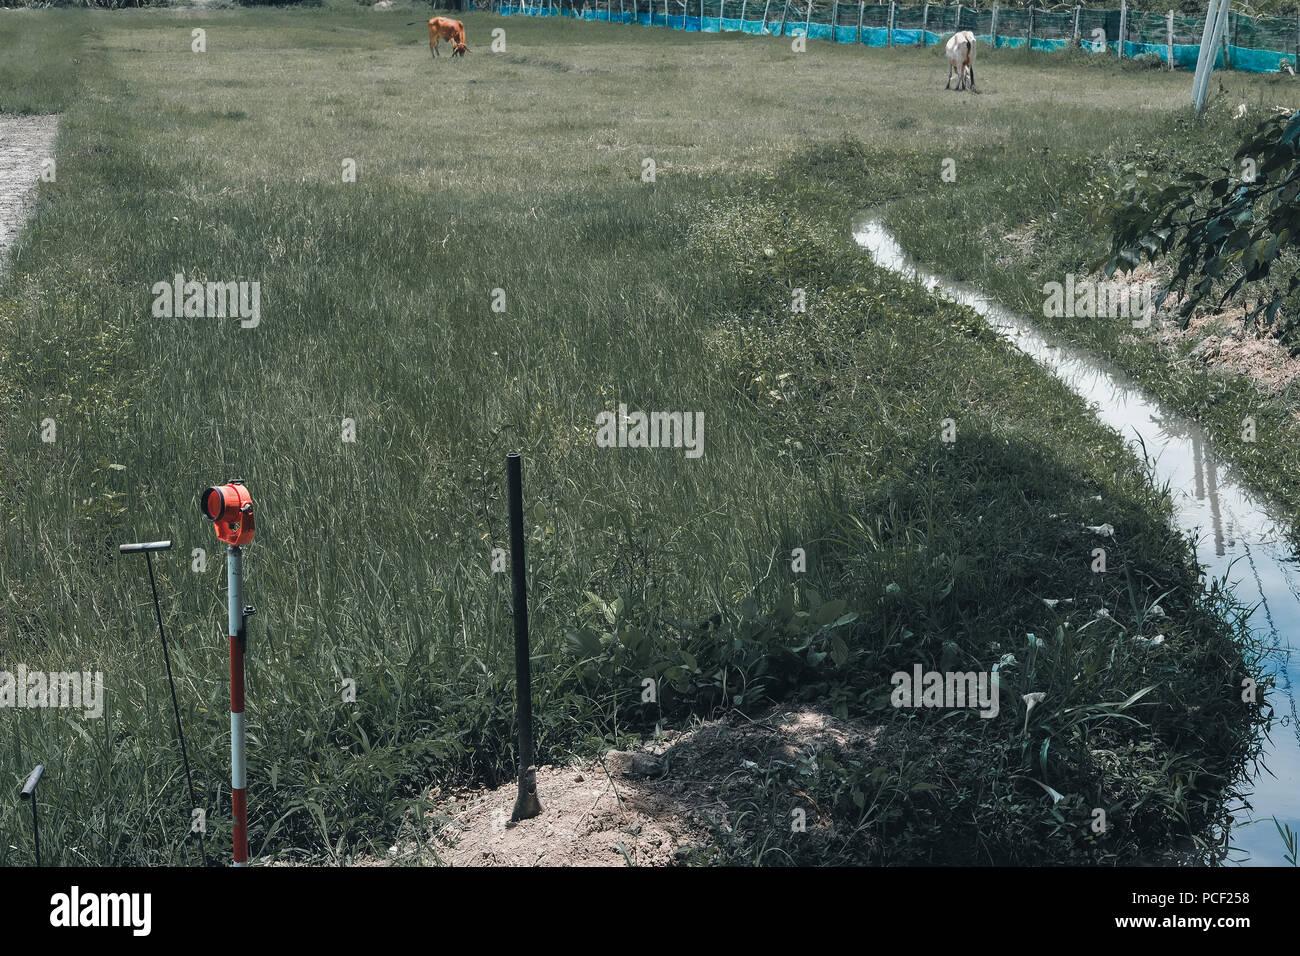 land surveyor using pole for measuring ground control point